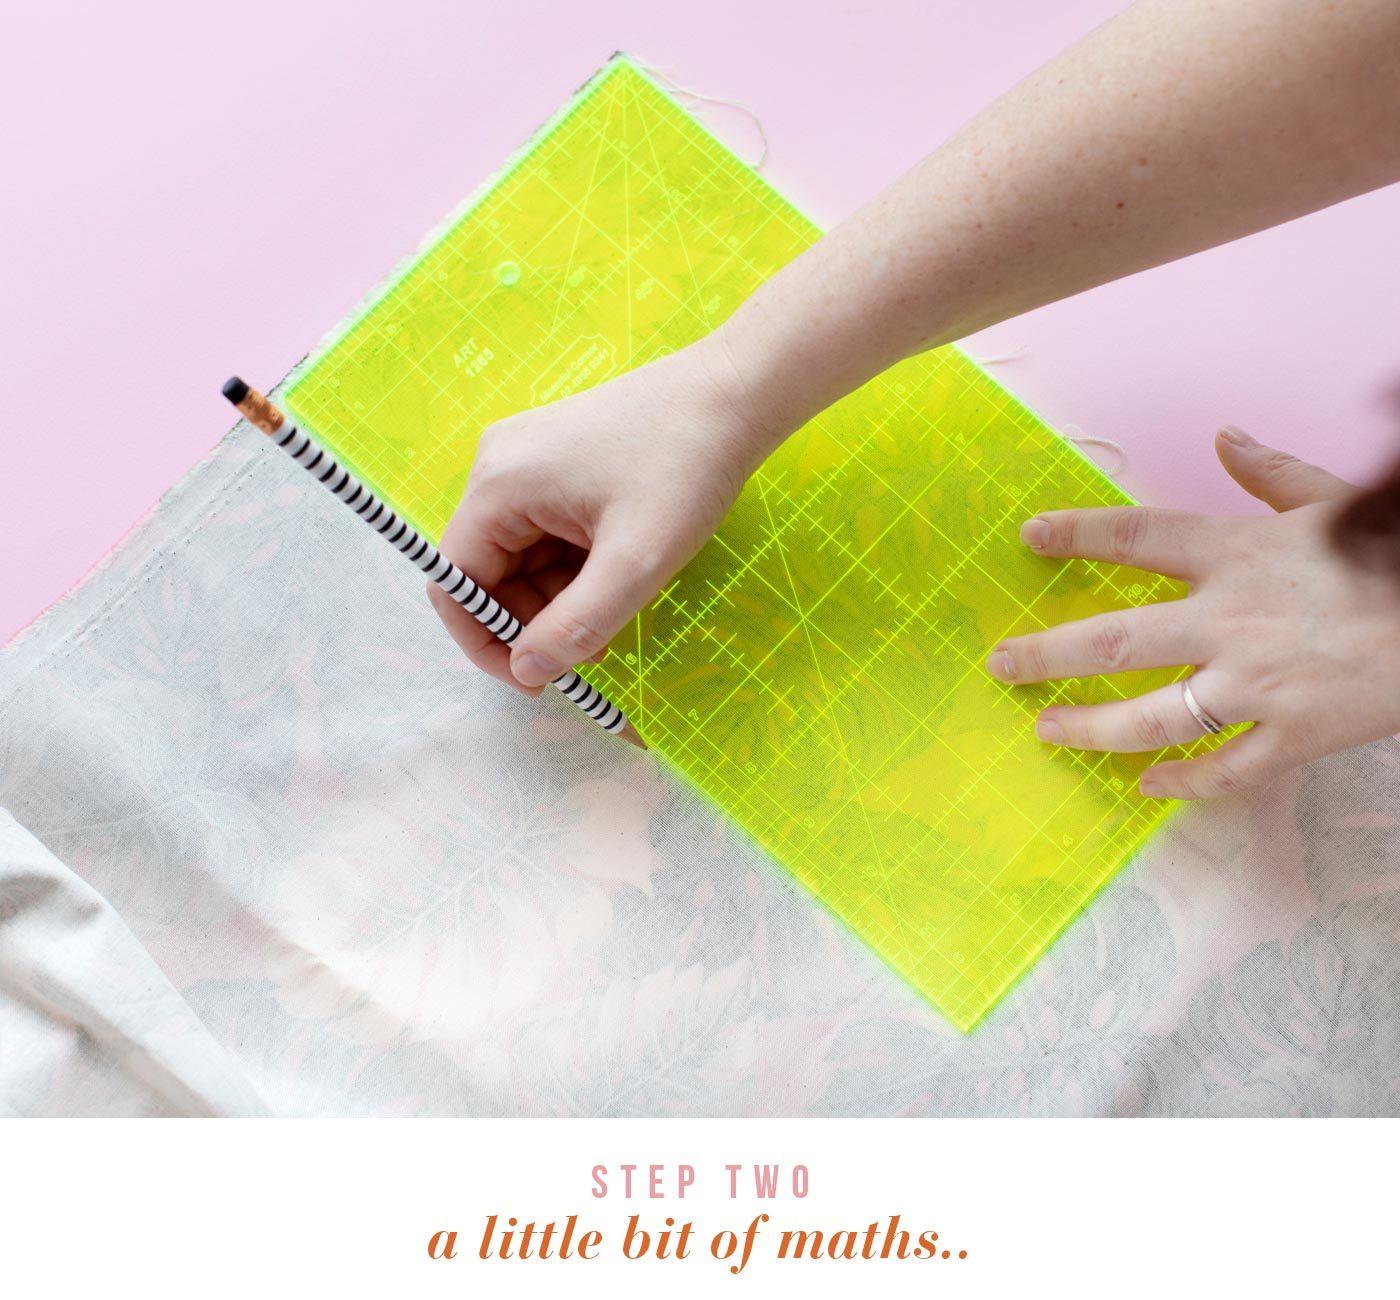 A little bit of maths. Measure and mark out 2 napkins (14.5 x 19cm each) plus 2 placemats  (25 x 19cm)